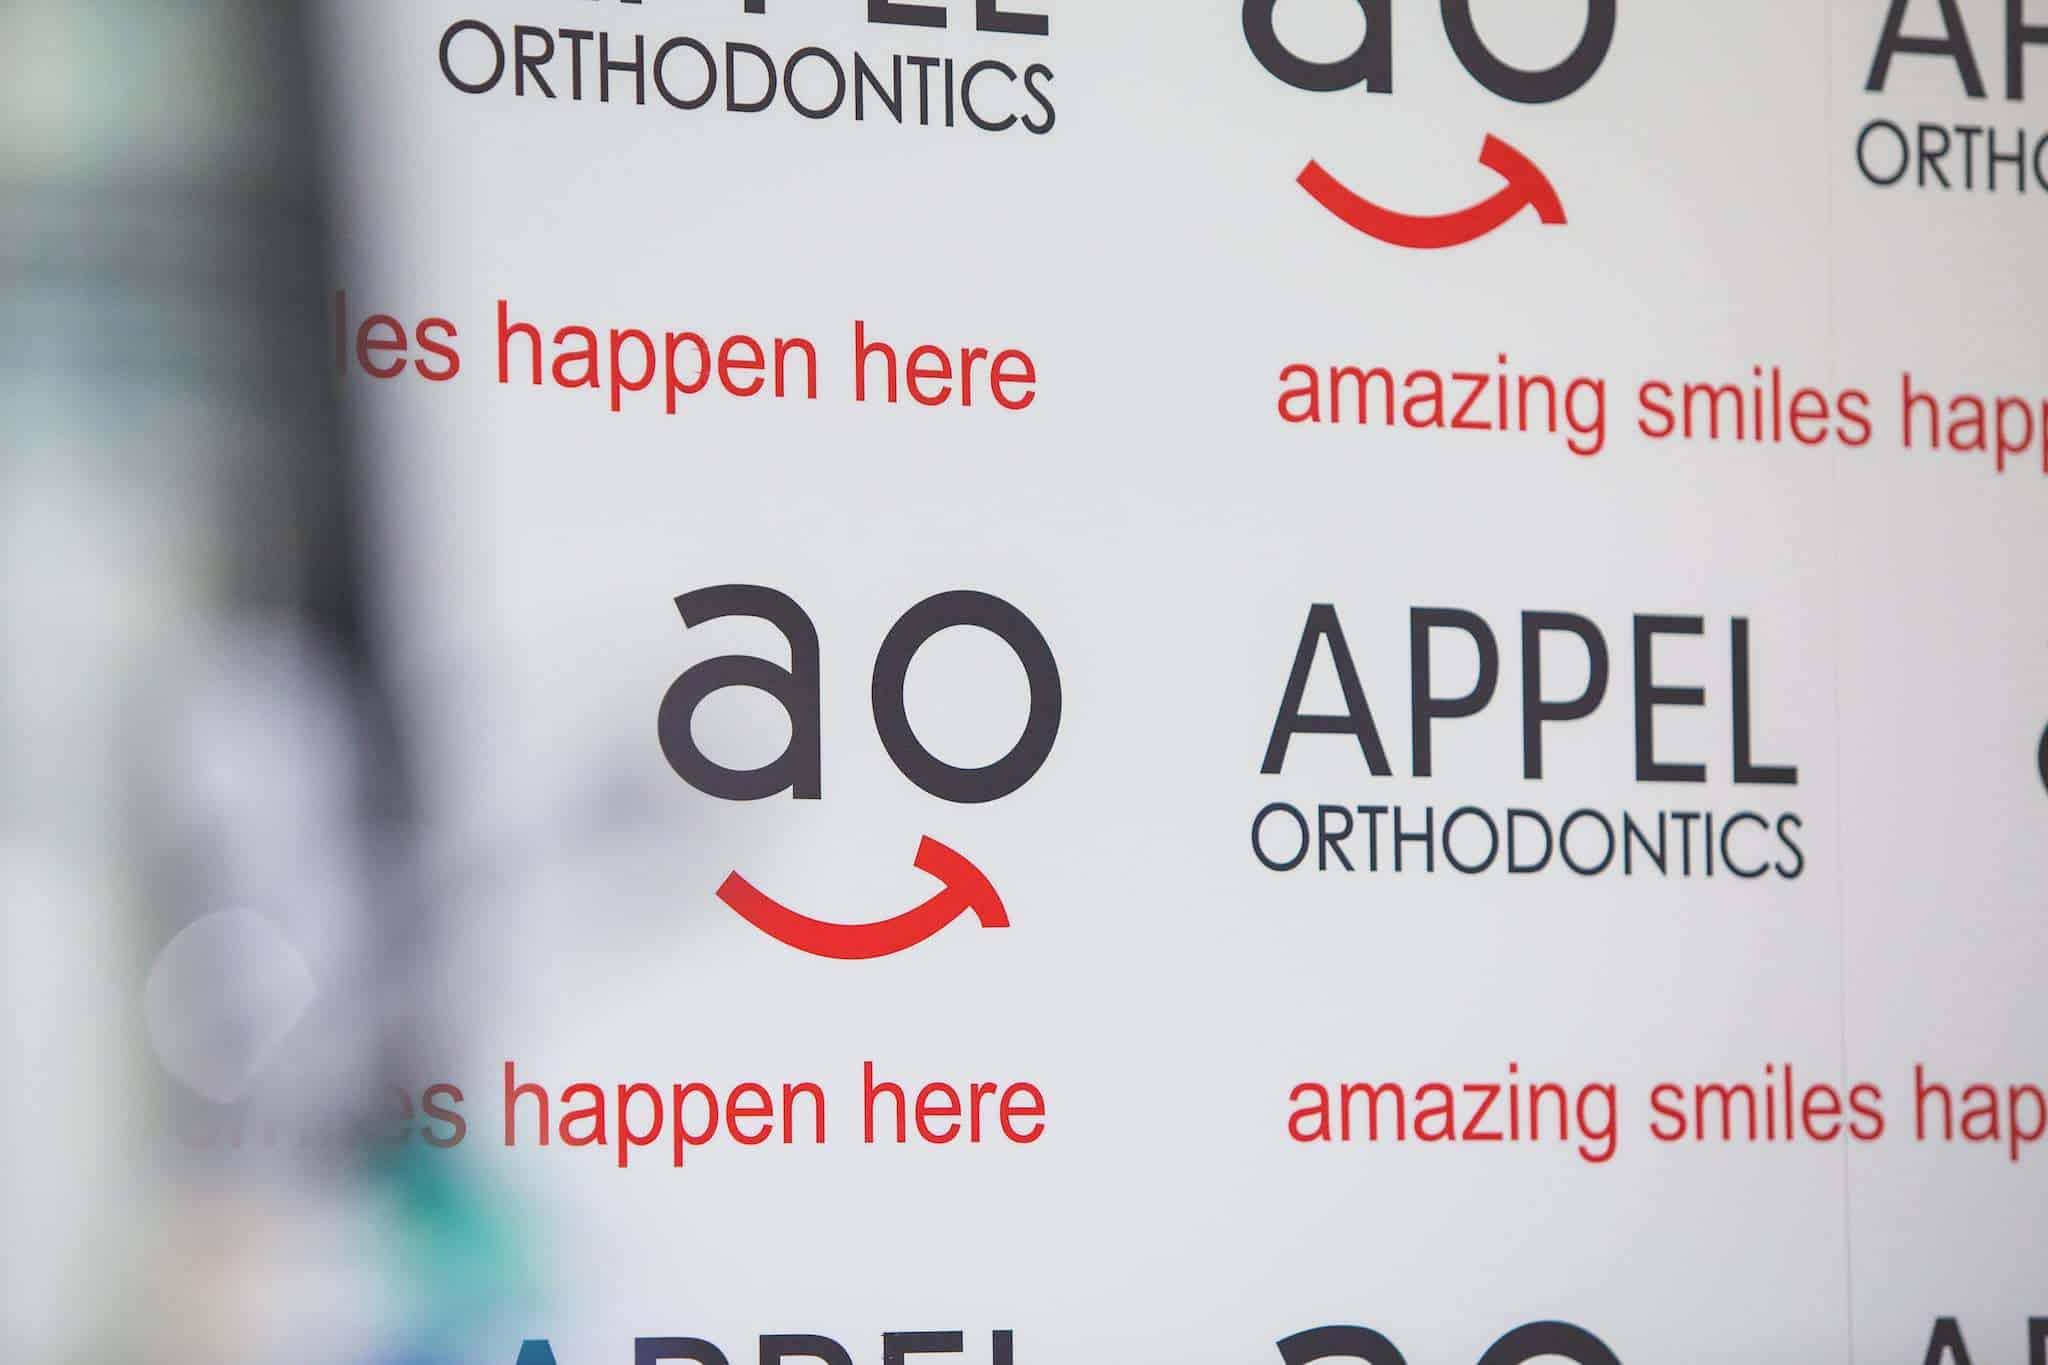 Appel Orthodontics Philadelphia Orthodontics Dr. Appel 22 1 - Patients' Stories